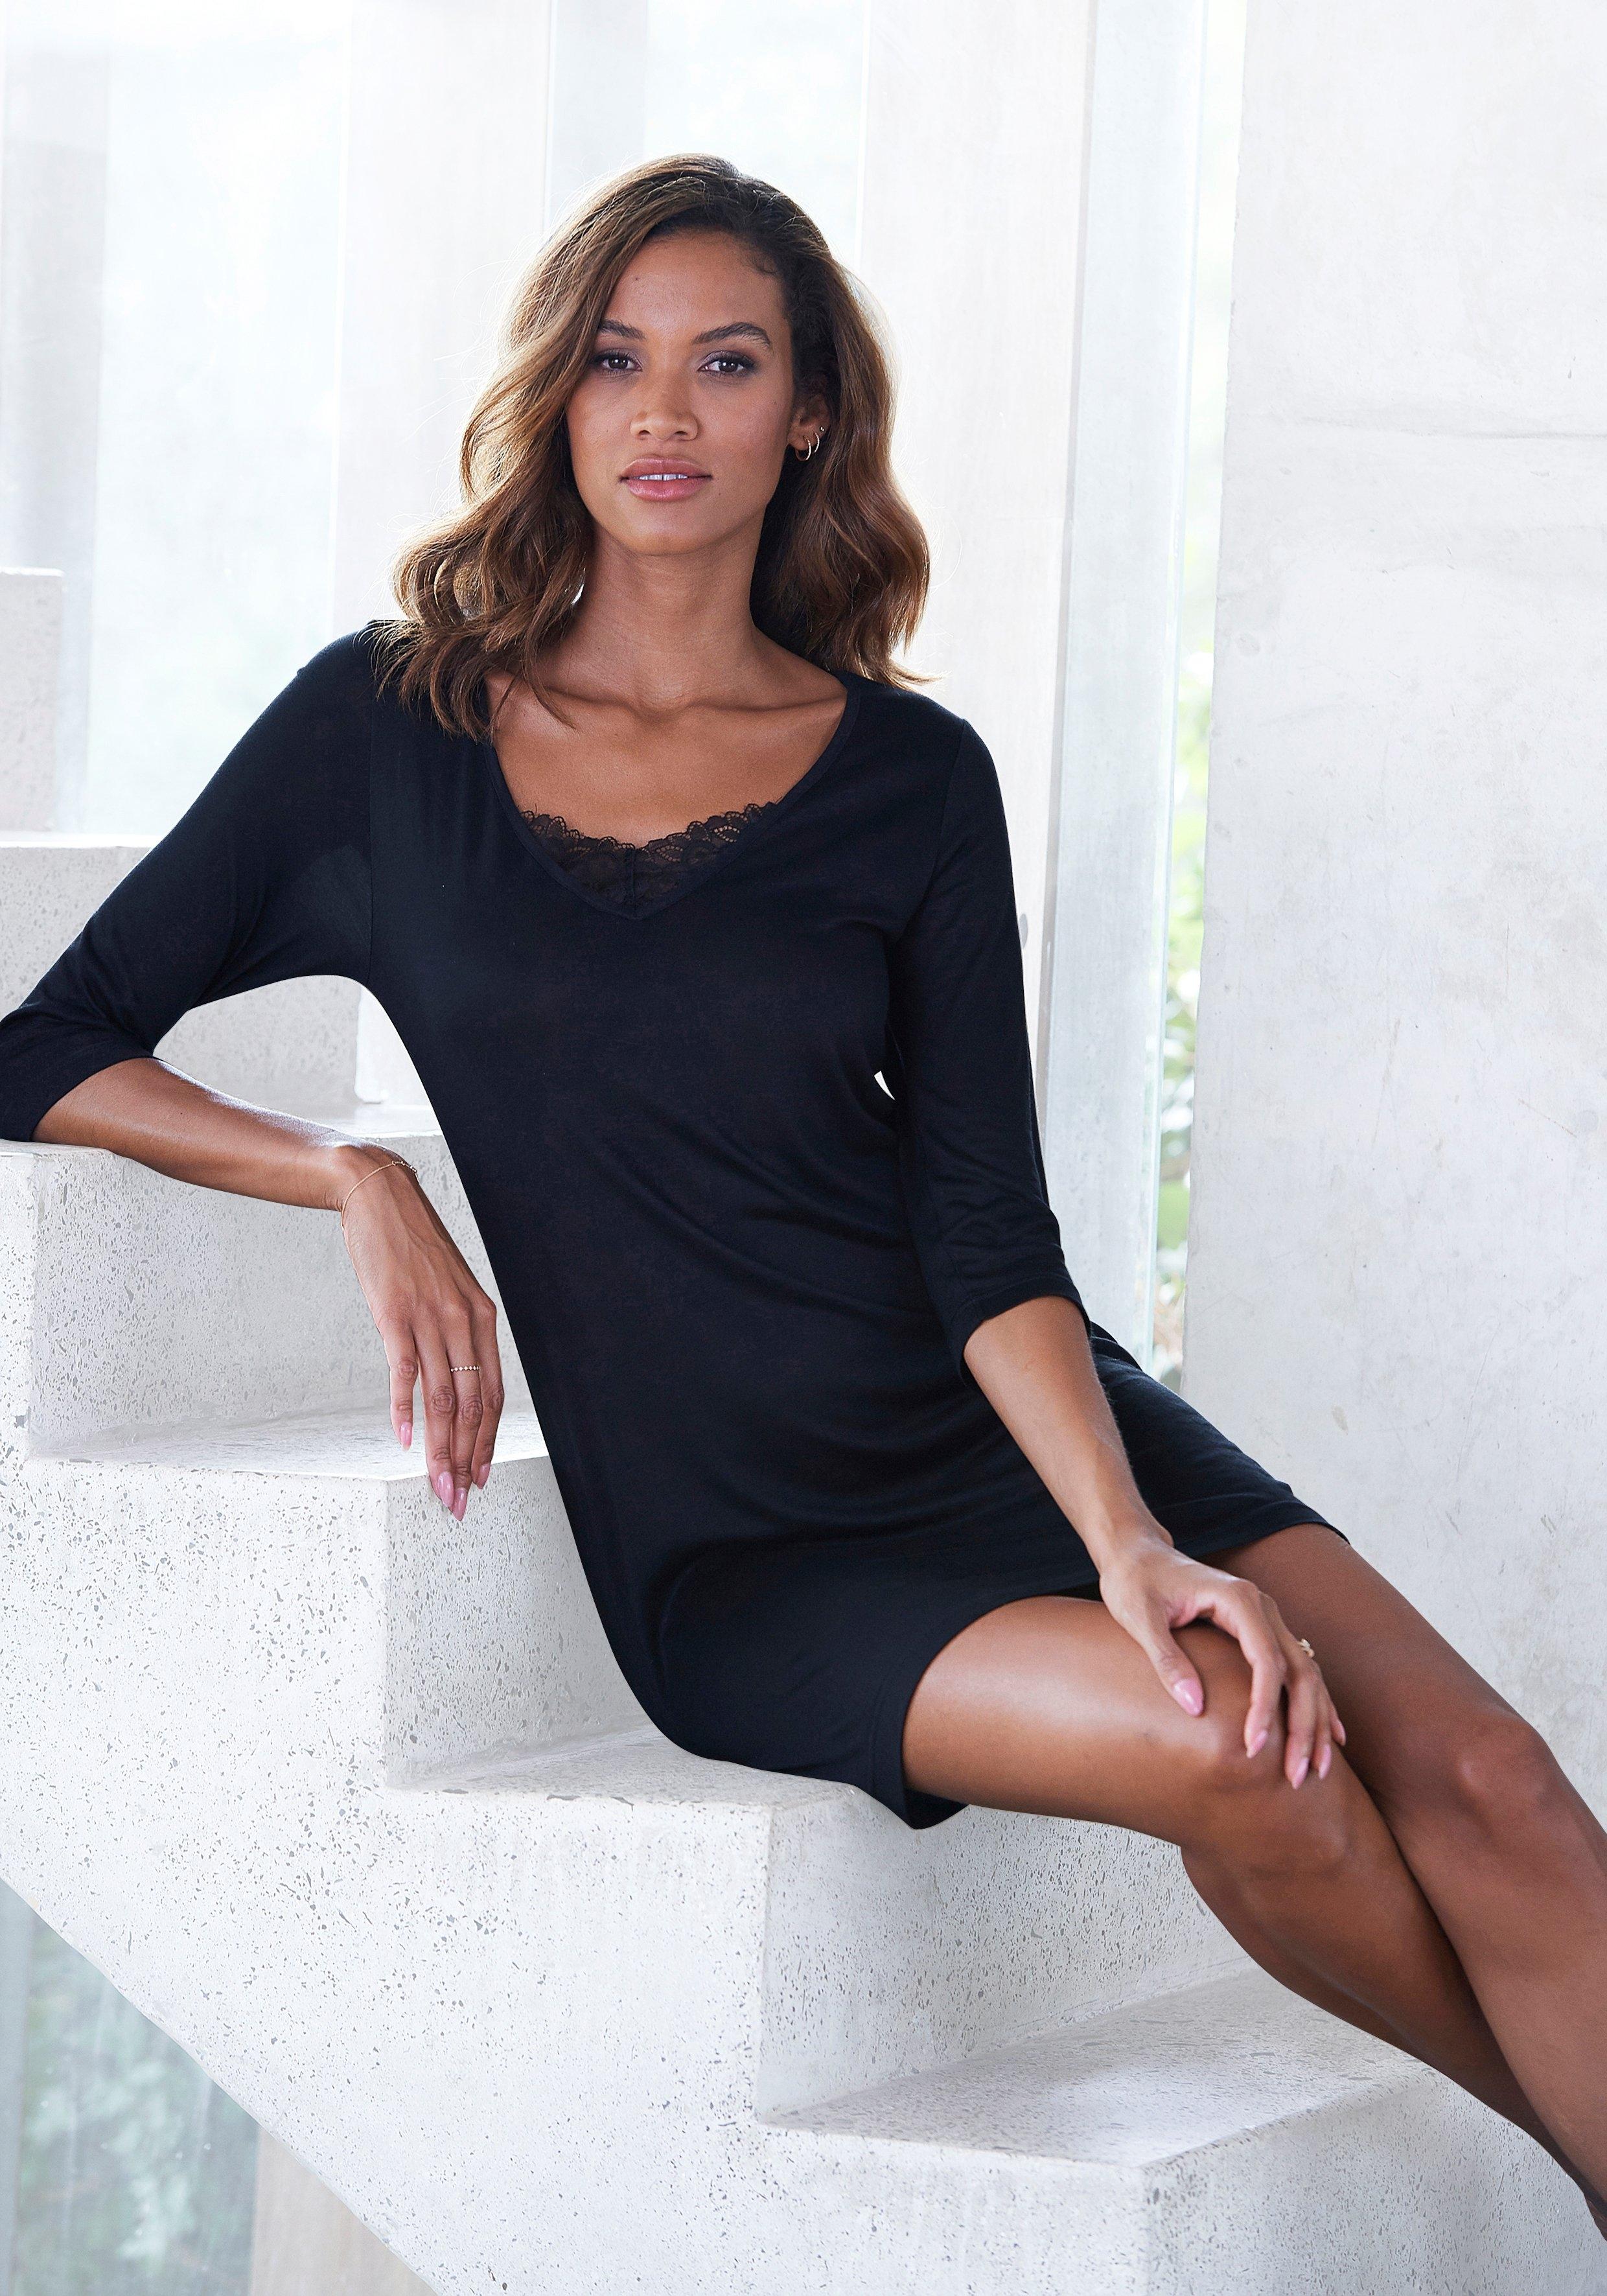 LASCANA nachthemd nu online kopen bij Lascana